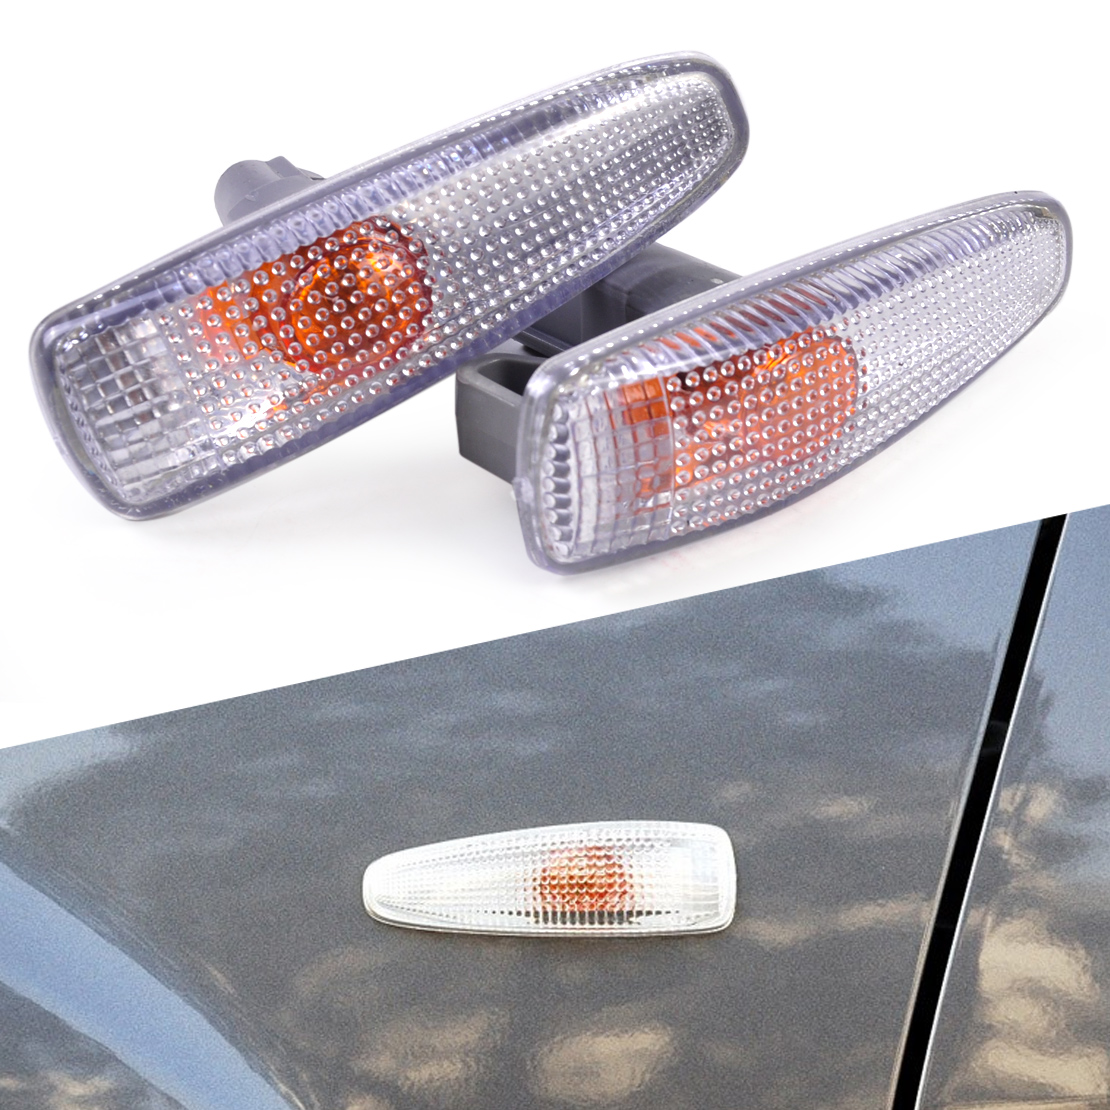 beler 2x New Grey Plastic Turn Signal Lamp Lights Fender Side for Mitsubishi Lancer 2008 2009 2010 2011 2012 2013 2014 8351A047 reinforced radiator coolant silicone hose for mitsubishi evolution evo x 10 10x cz4a 4b11 2008 2013 2012 2011 2010 2009